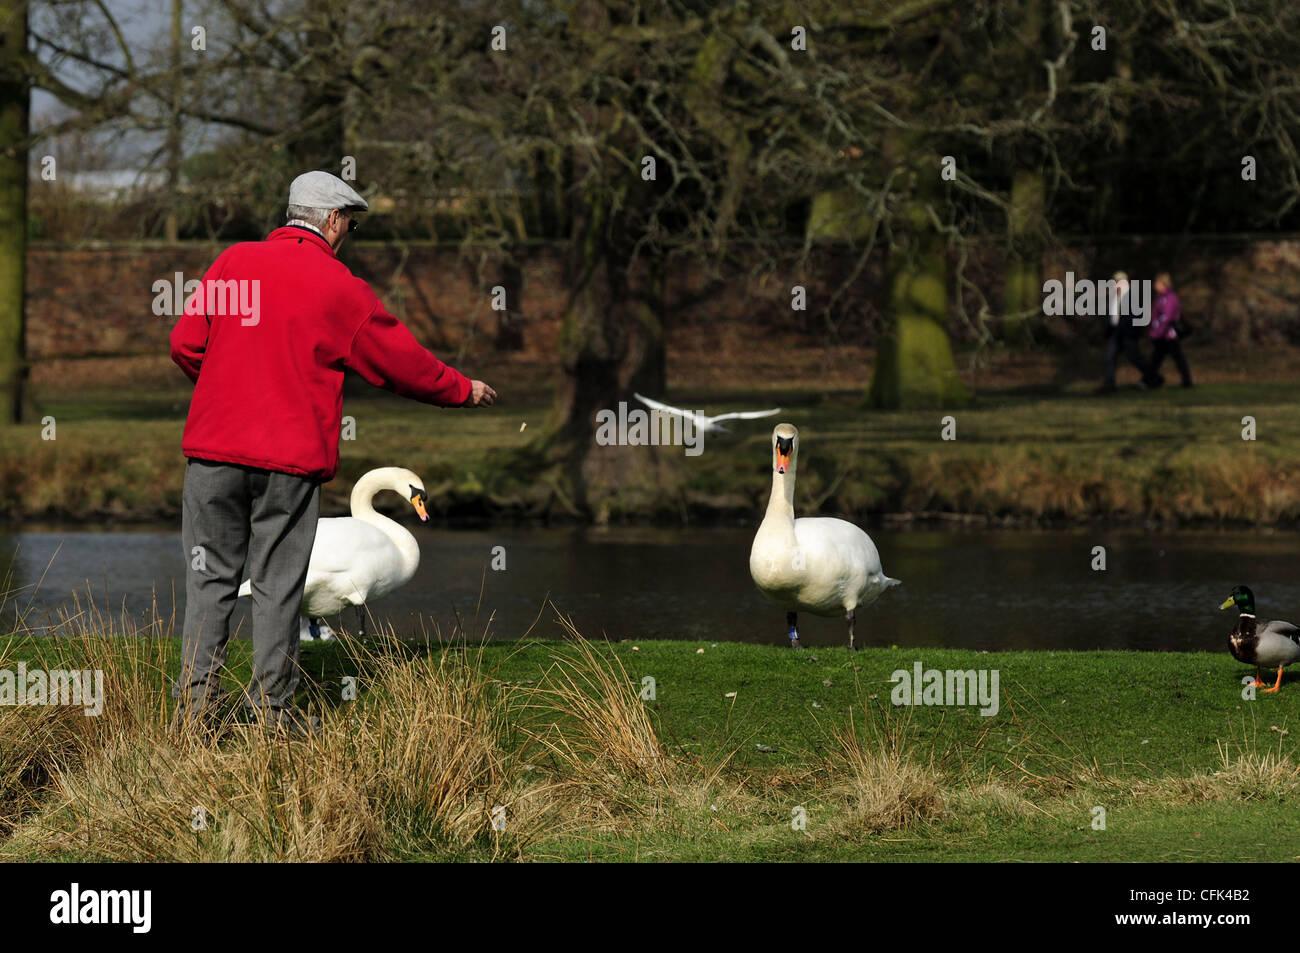 Man feeding mute swans at Dunham Massey - Stock Image